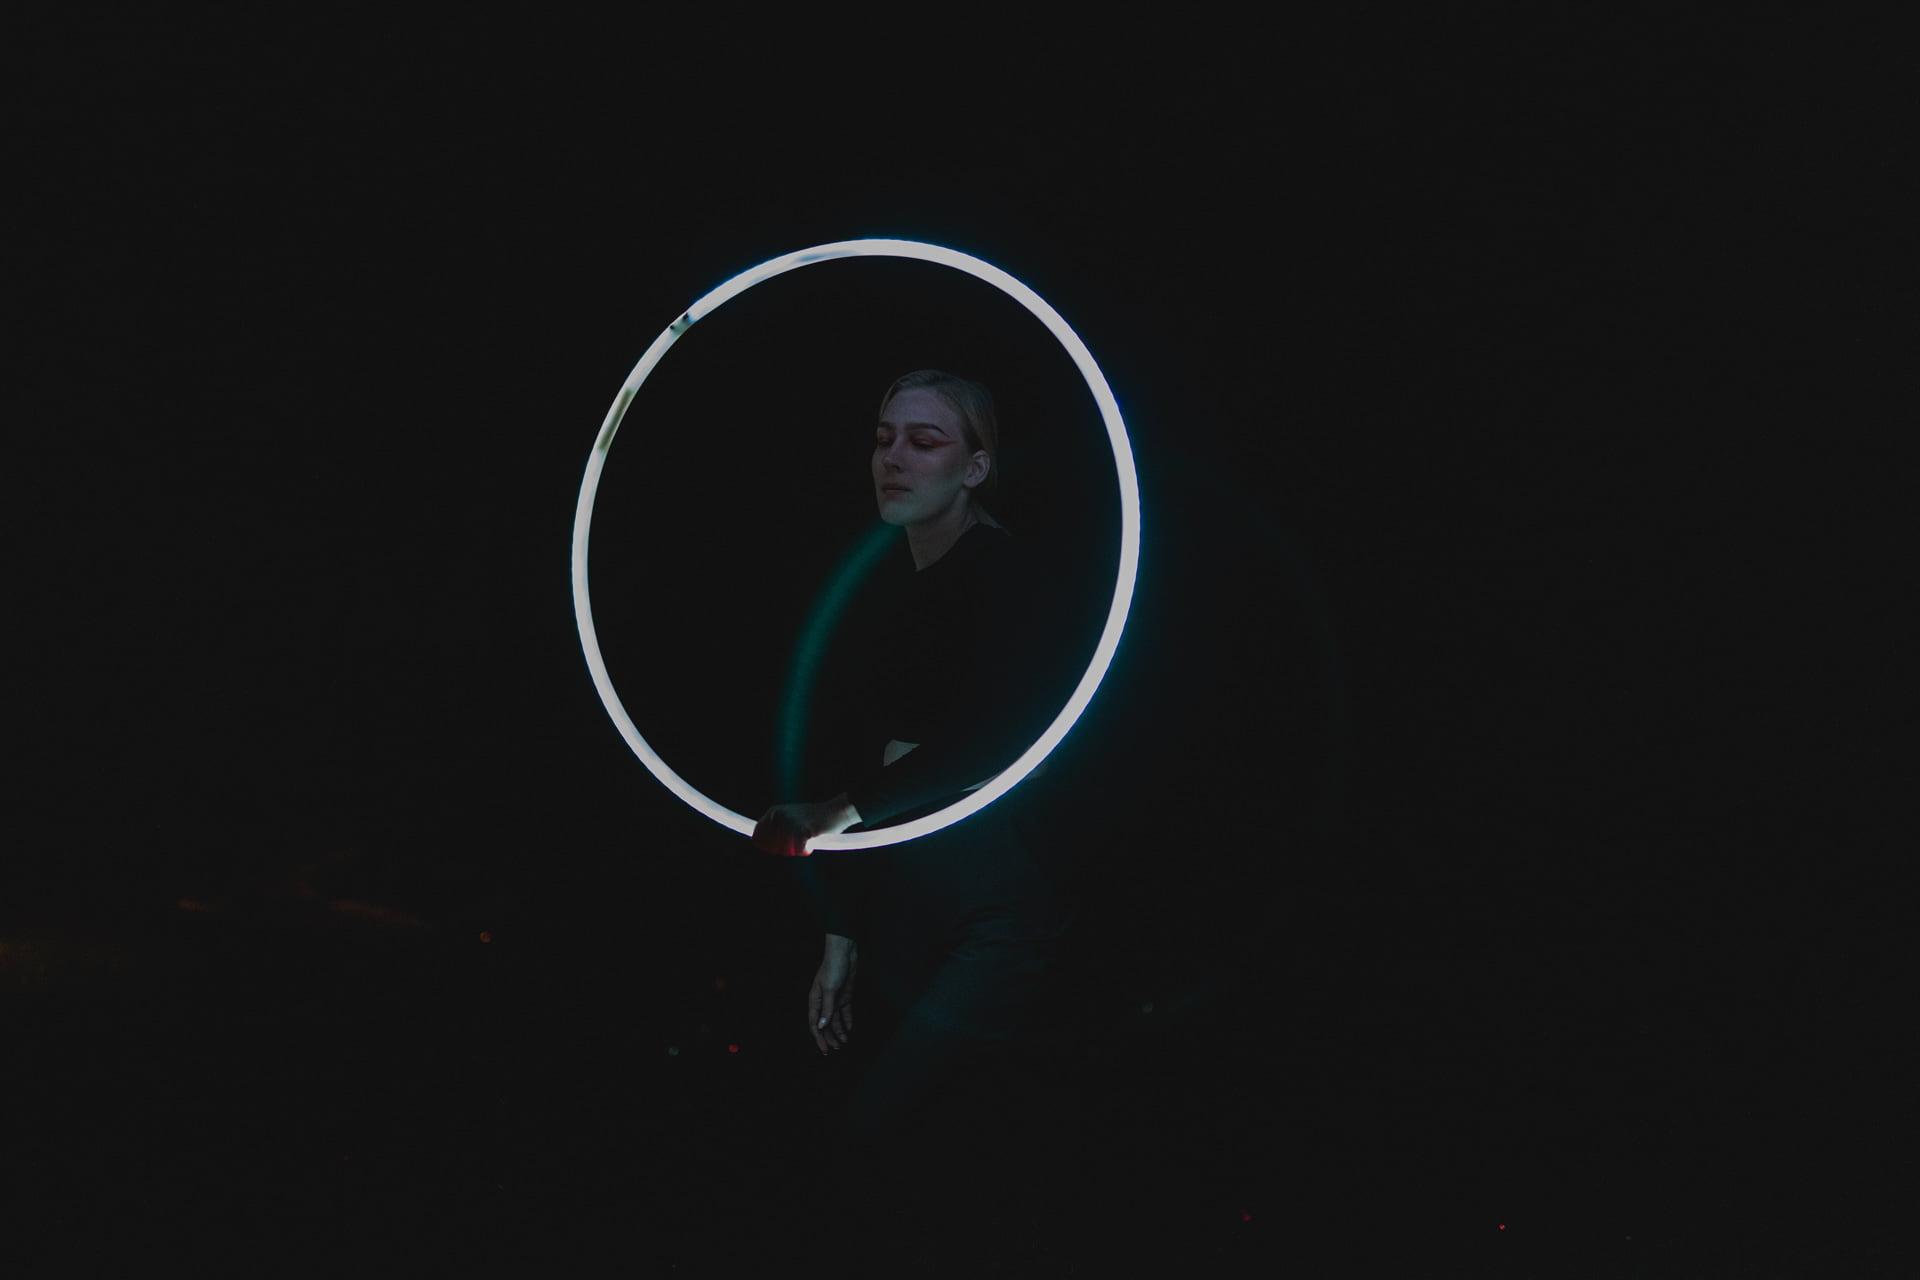 Light Show hula hoop